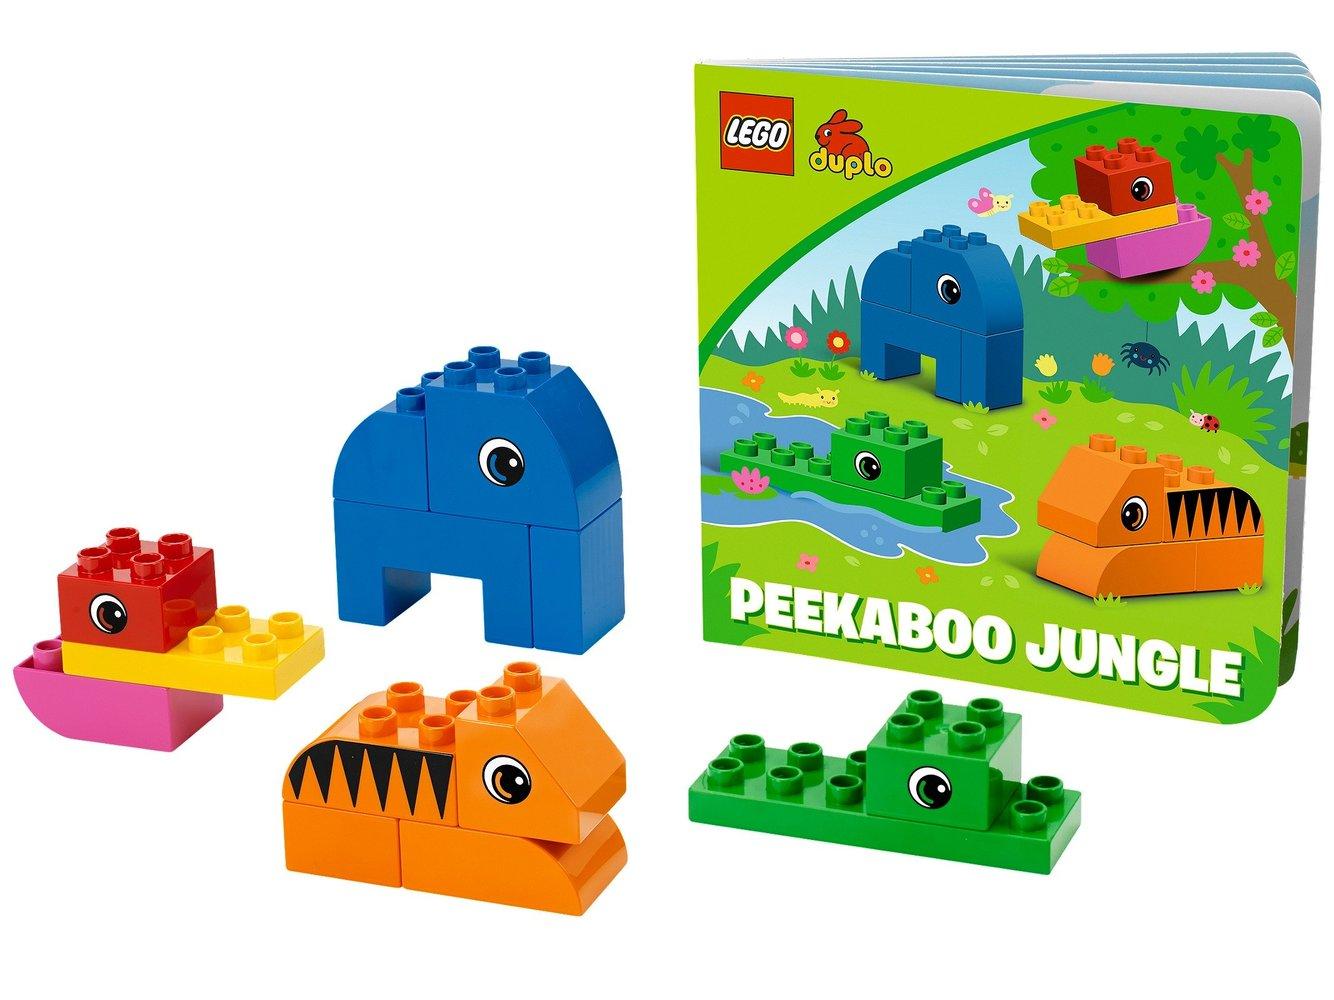 Peekaboo Jungle